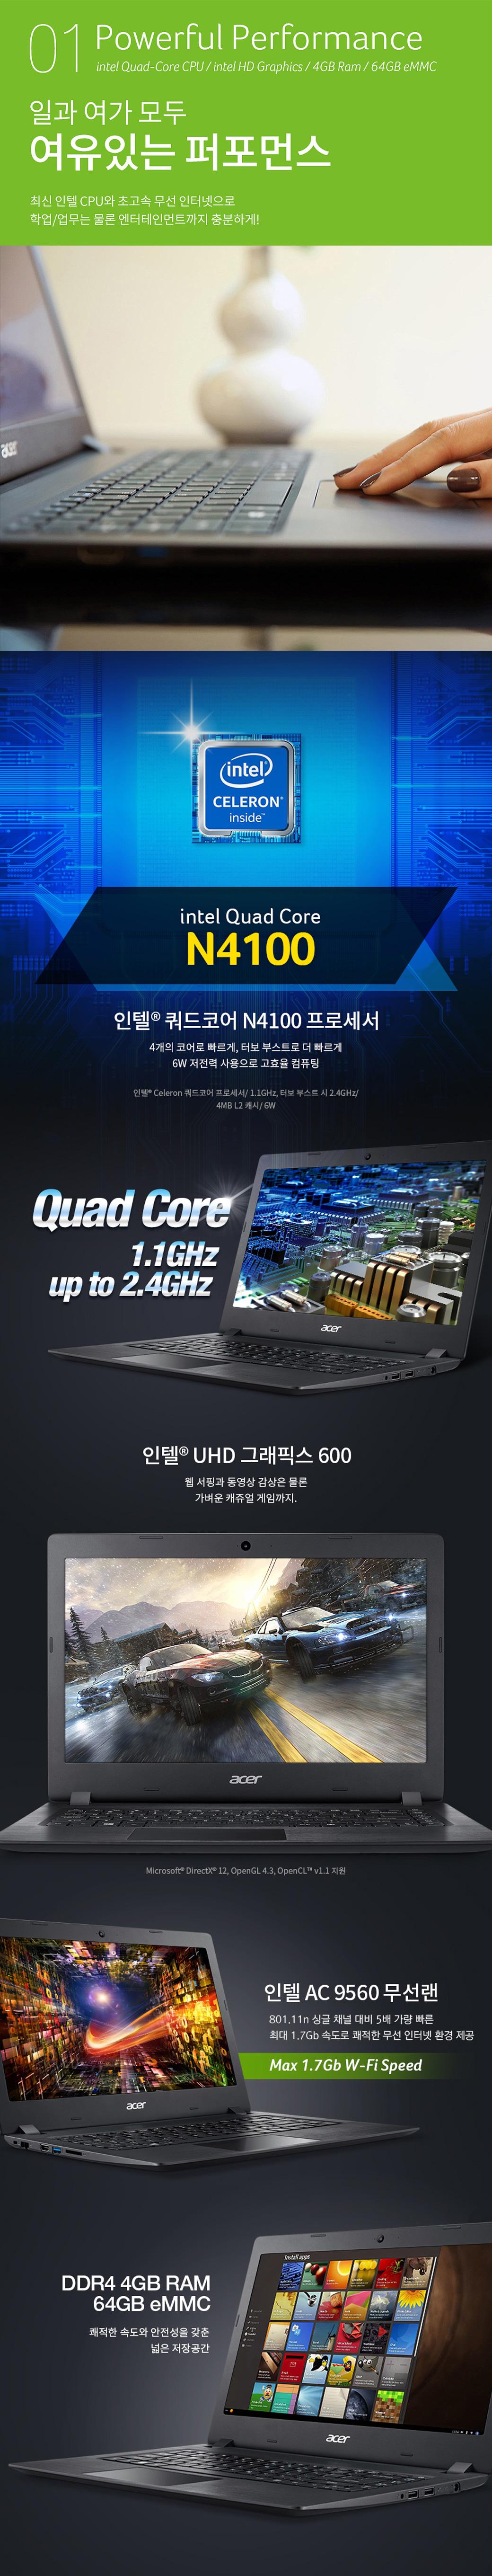 01 Powerful Performance intel Quad-Core CPU/intel HD Graphics/4GB Ram/64GB eMMC 일과 여가 모두 여유있는 퍼포먼스. 최신 인텔 CPU와 초고속 무선 인터넷으로 학업/업무는 물론 엔터테인먼트까지 충분하게! -인텔 쿼드코어 N4100 프로세서 4개의 코어로 빠르게, 터보 부스터로 더 빠르게 6W 저전력 사용으로 고효율 컴퓨팅 -인텔 UHD 그래픽스 600 웹 서핑과 동영상 감상은 물론 가벼운 캐쥬얼 게임까지 -인텔 AC 9560 무선랜 801.11n 싱글 채널 대비 5배 가량 빠른 최대 1.7Gb 속도로 쾌적한 무선 인터넷 환경 제공 -DDR4 4GB RAM 64GB eMMC 쾌적한 소곧와 안정성을 갖춘 넓은 저장공간